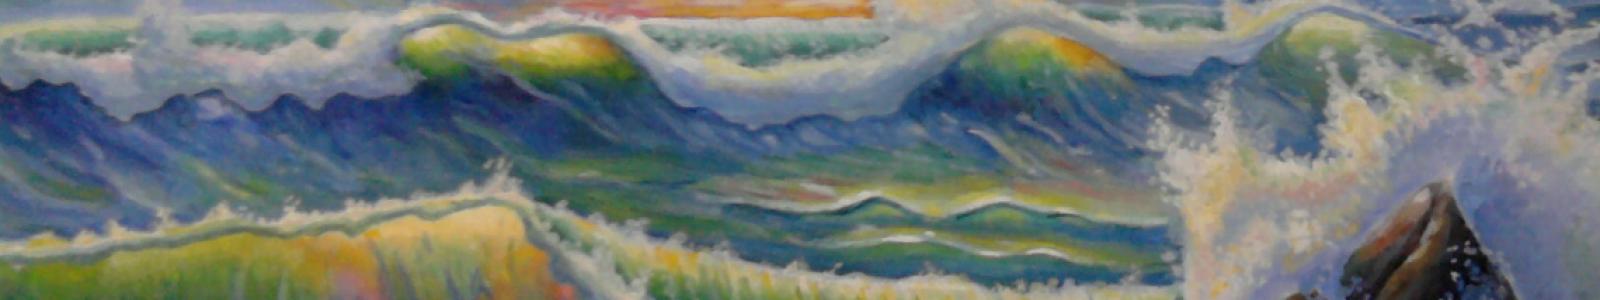 Gallery Painter Karyna Boiko